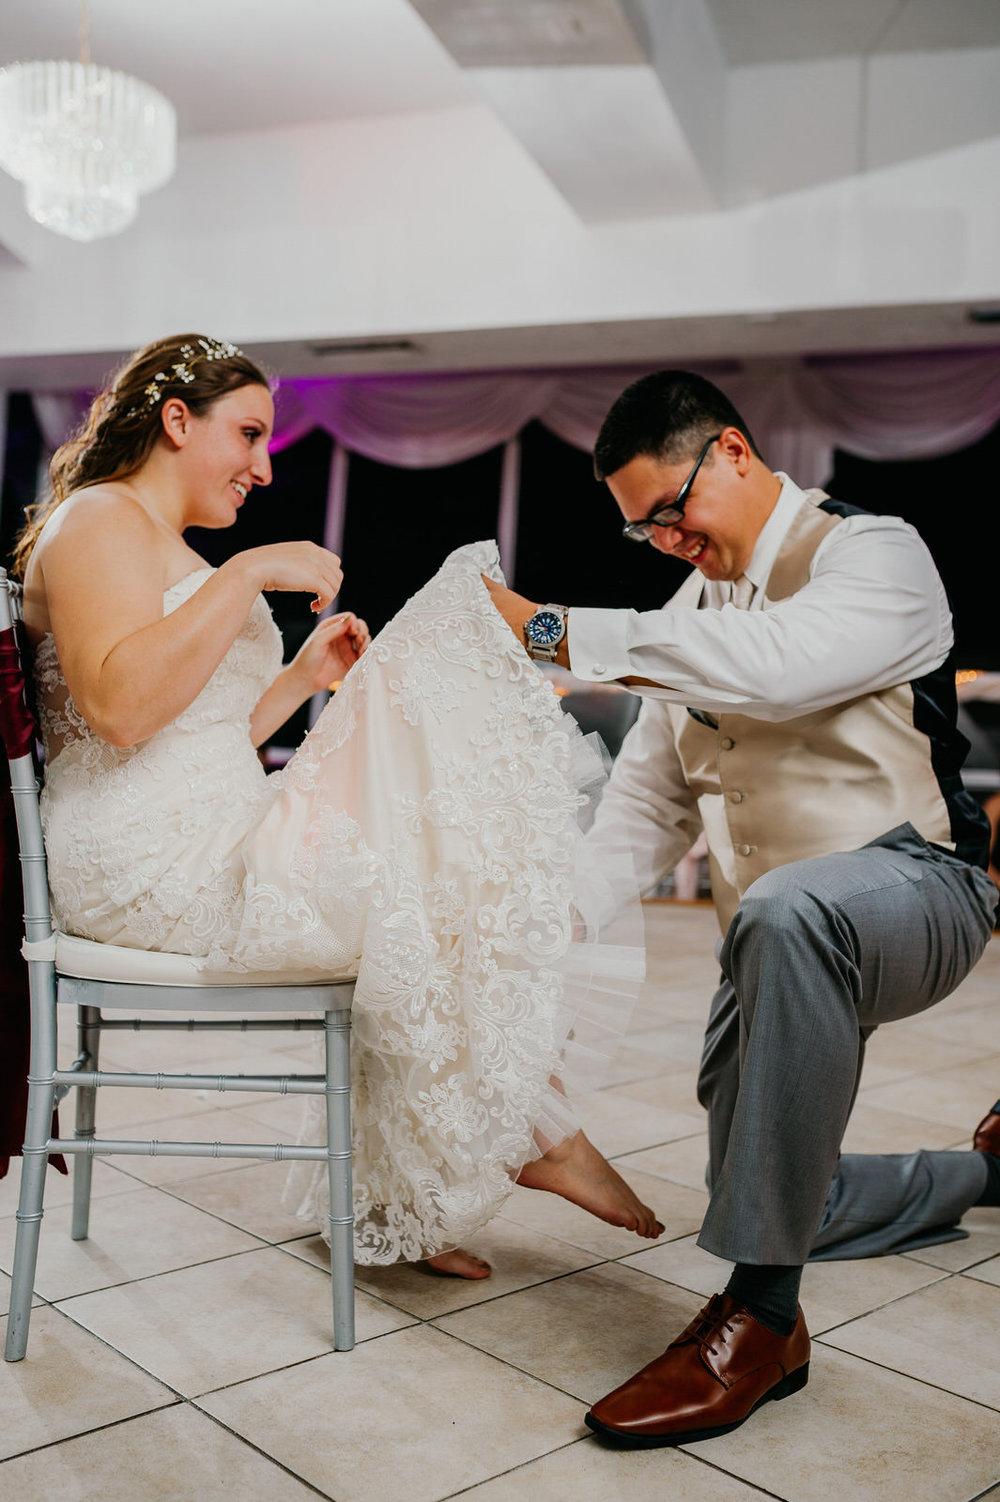 Mcneile_Photography_Wedding64.jpg